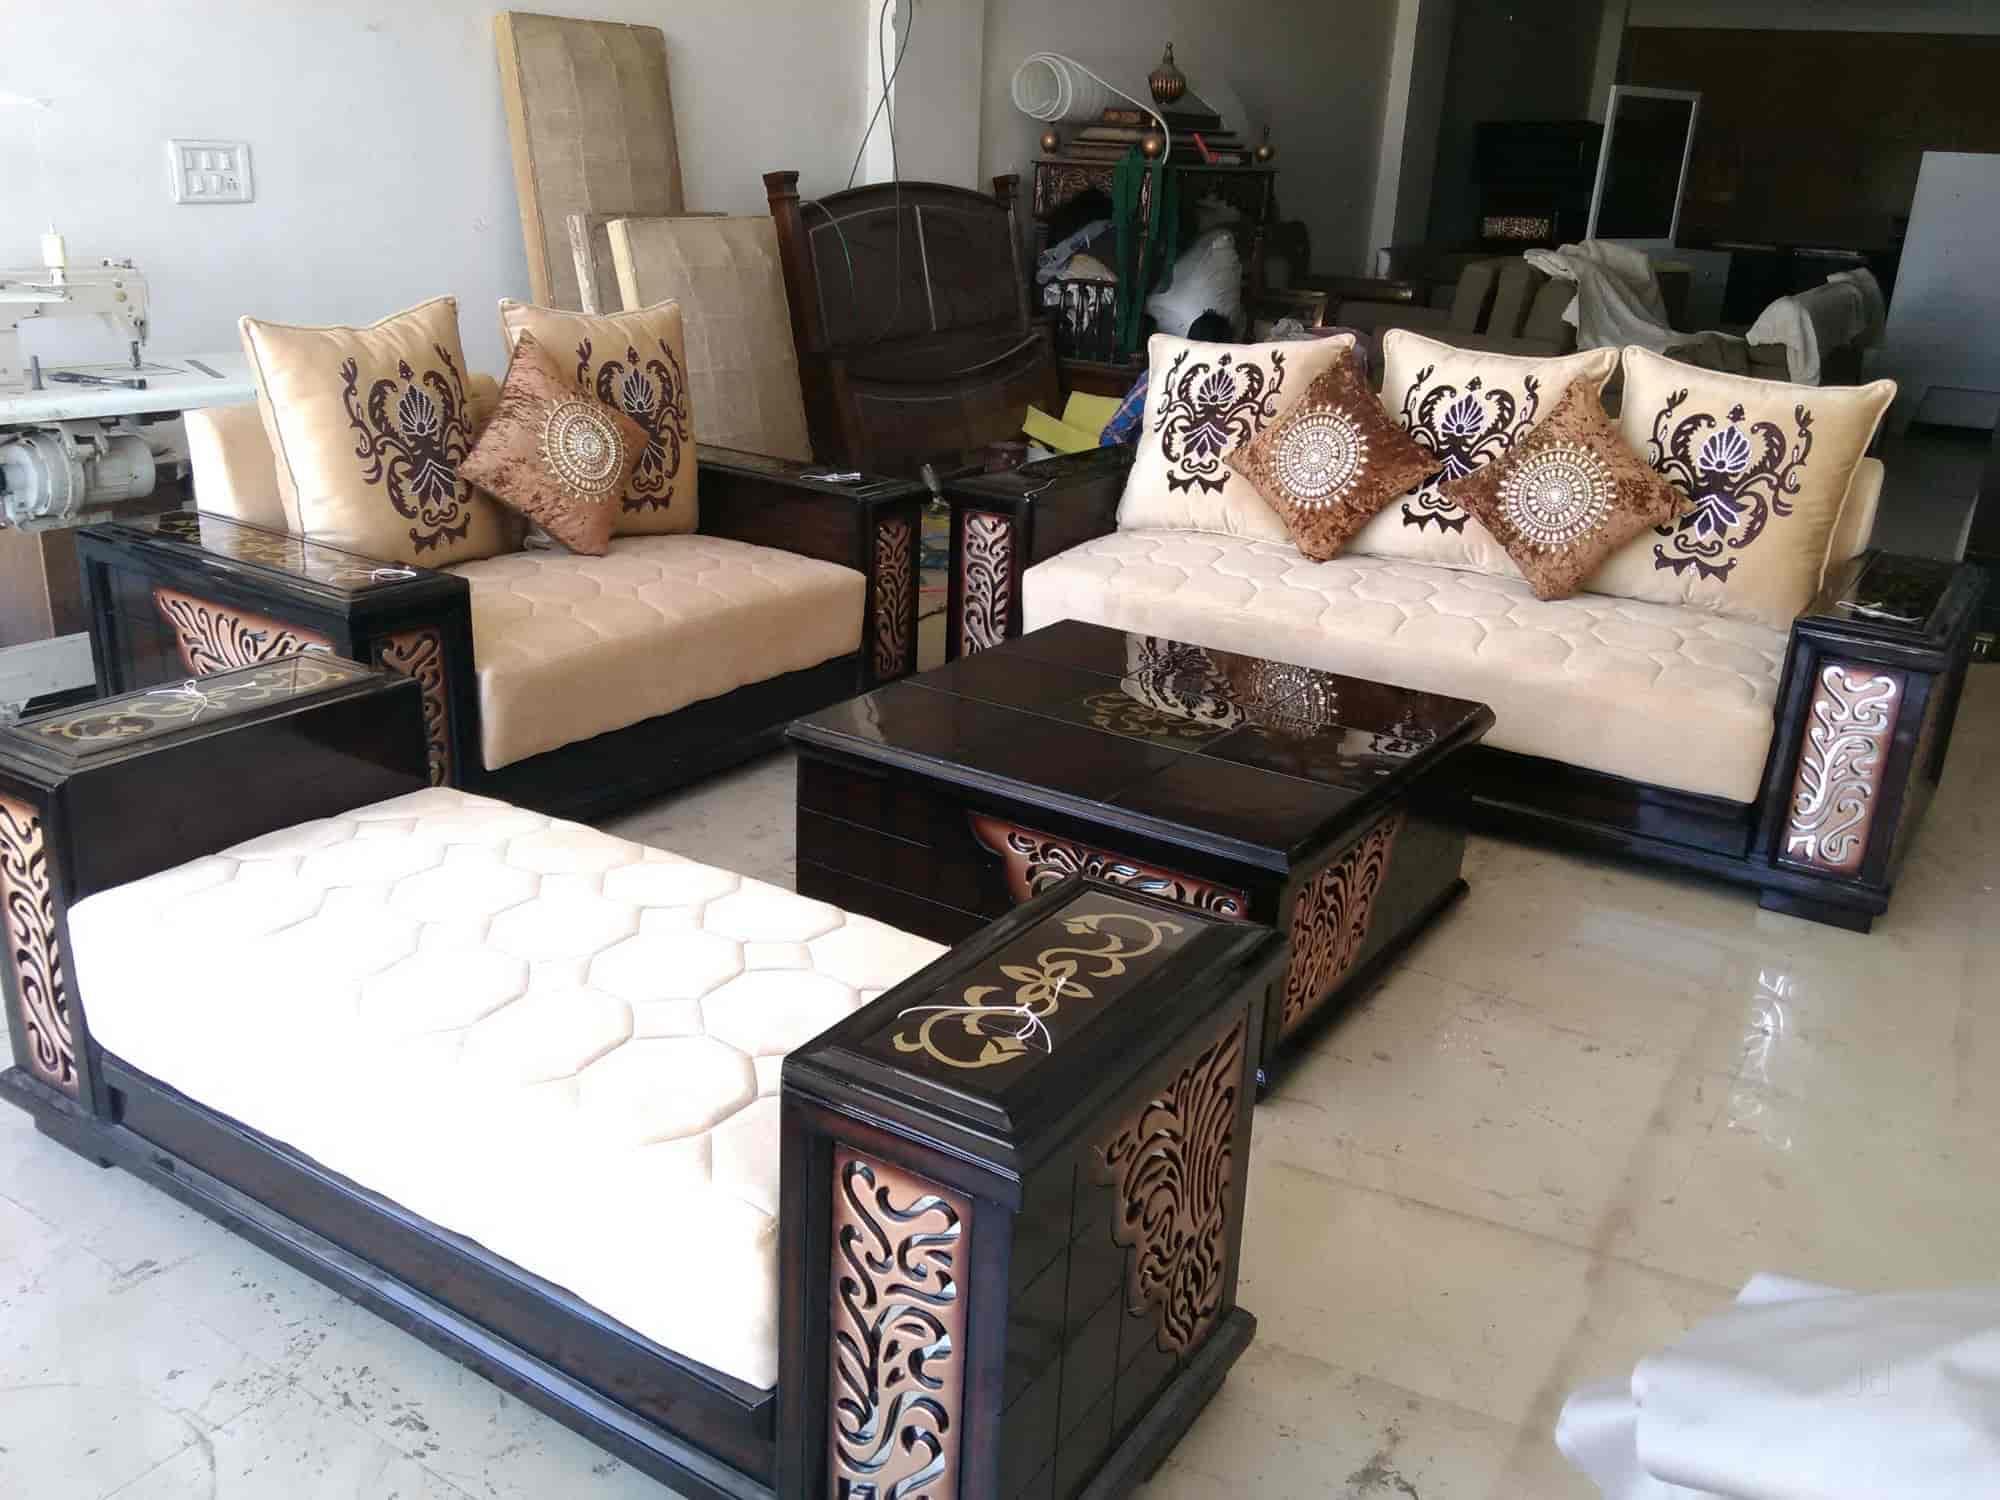 h k furniture, kirti nagar - furniture manufacturers in delhi - justdial